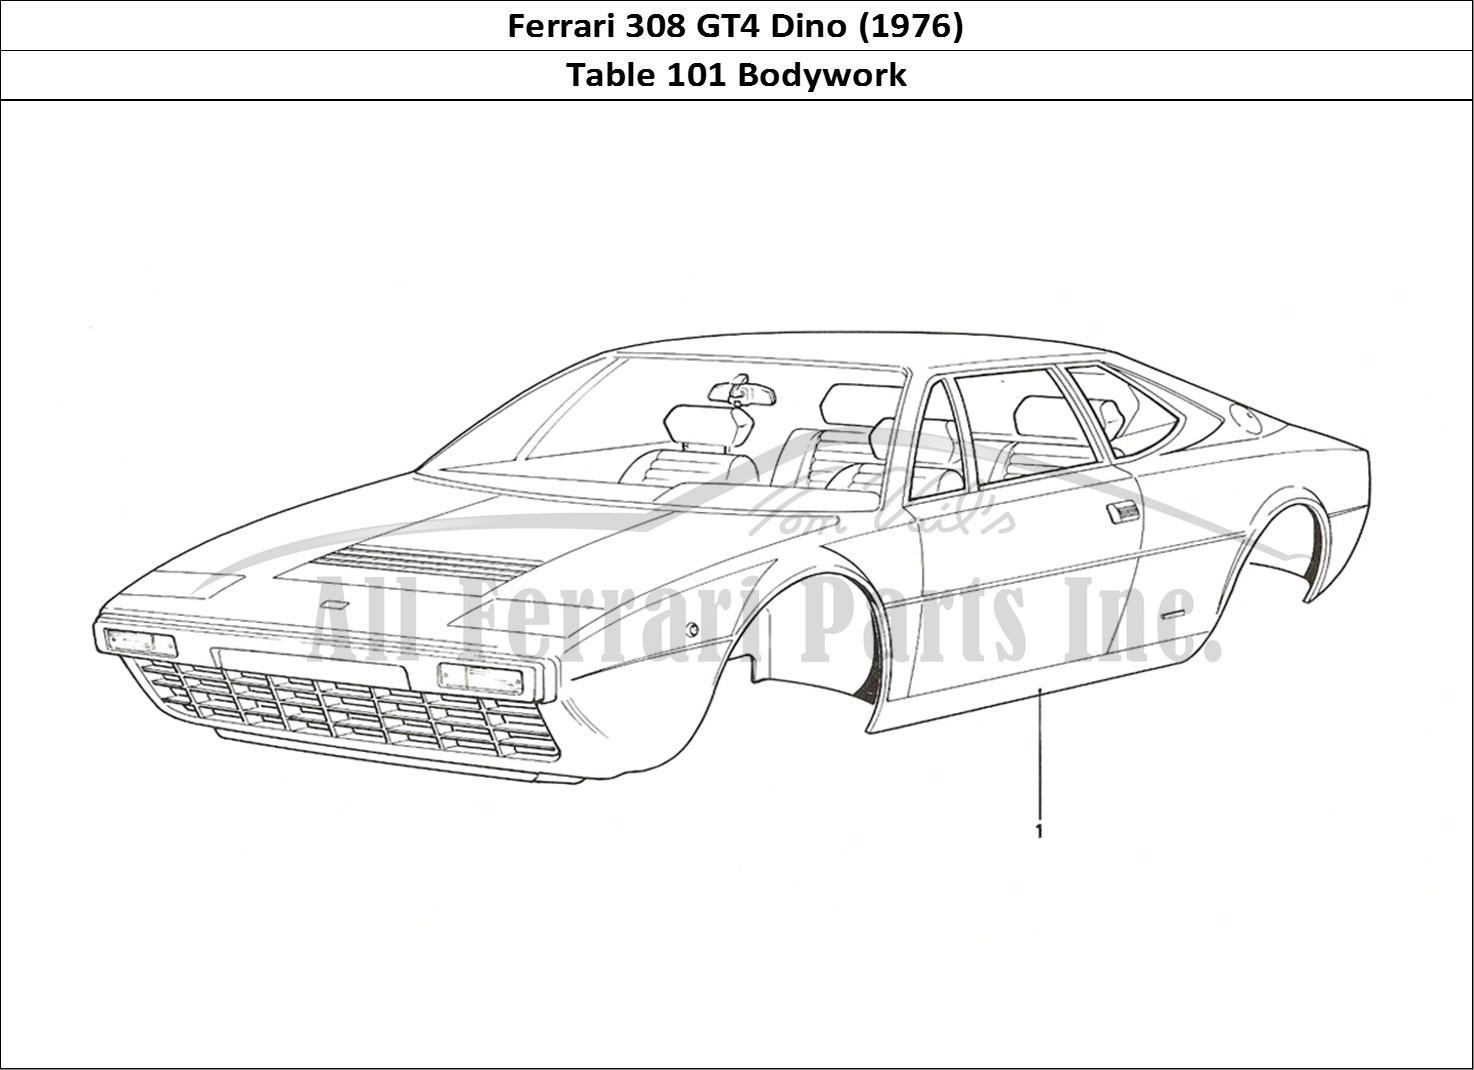 Buy original Ferrari 308 GT4 Dino (1976) 101 Bodywork